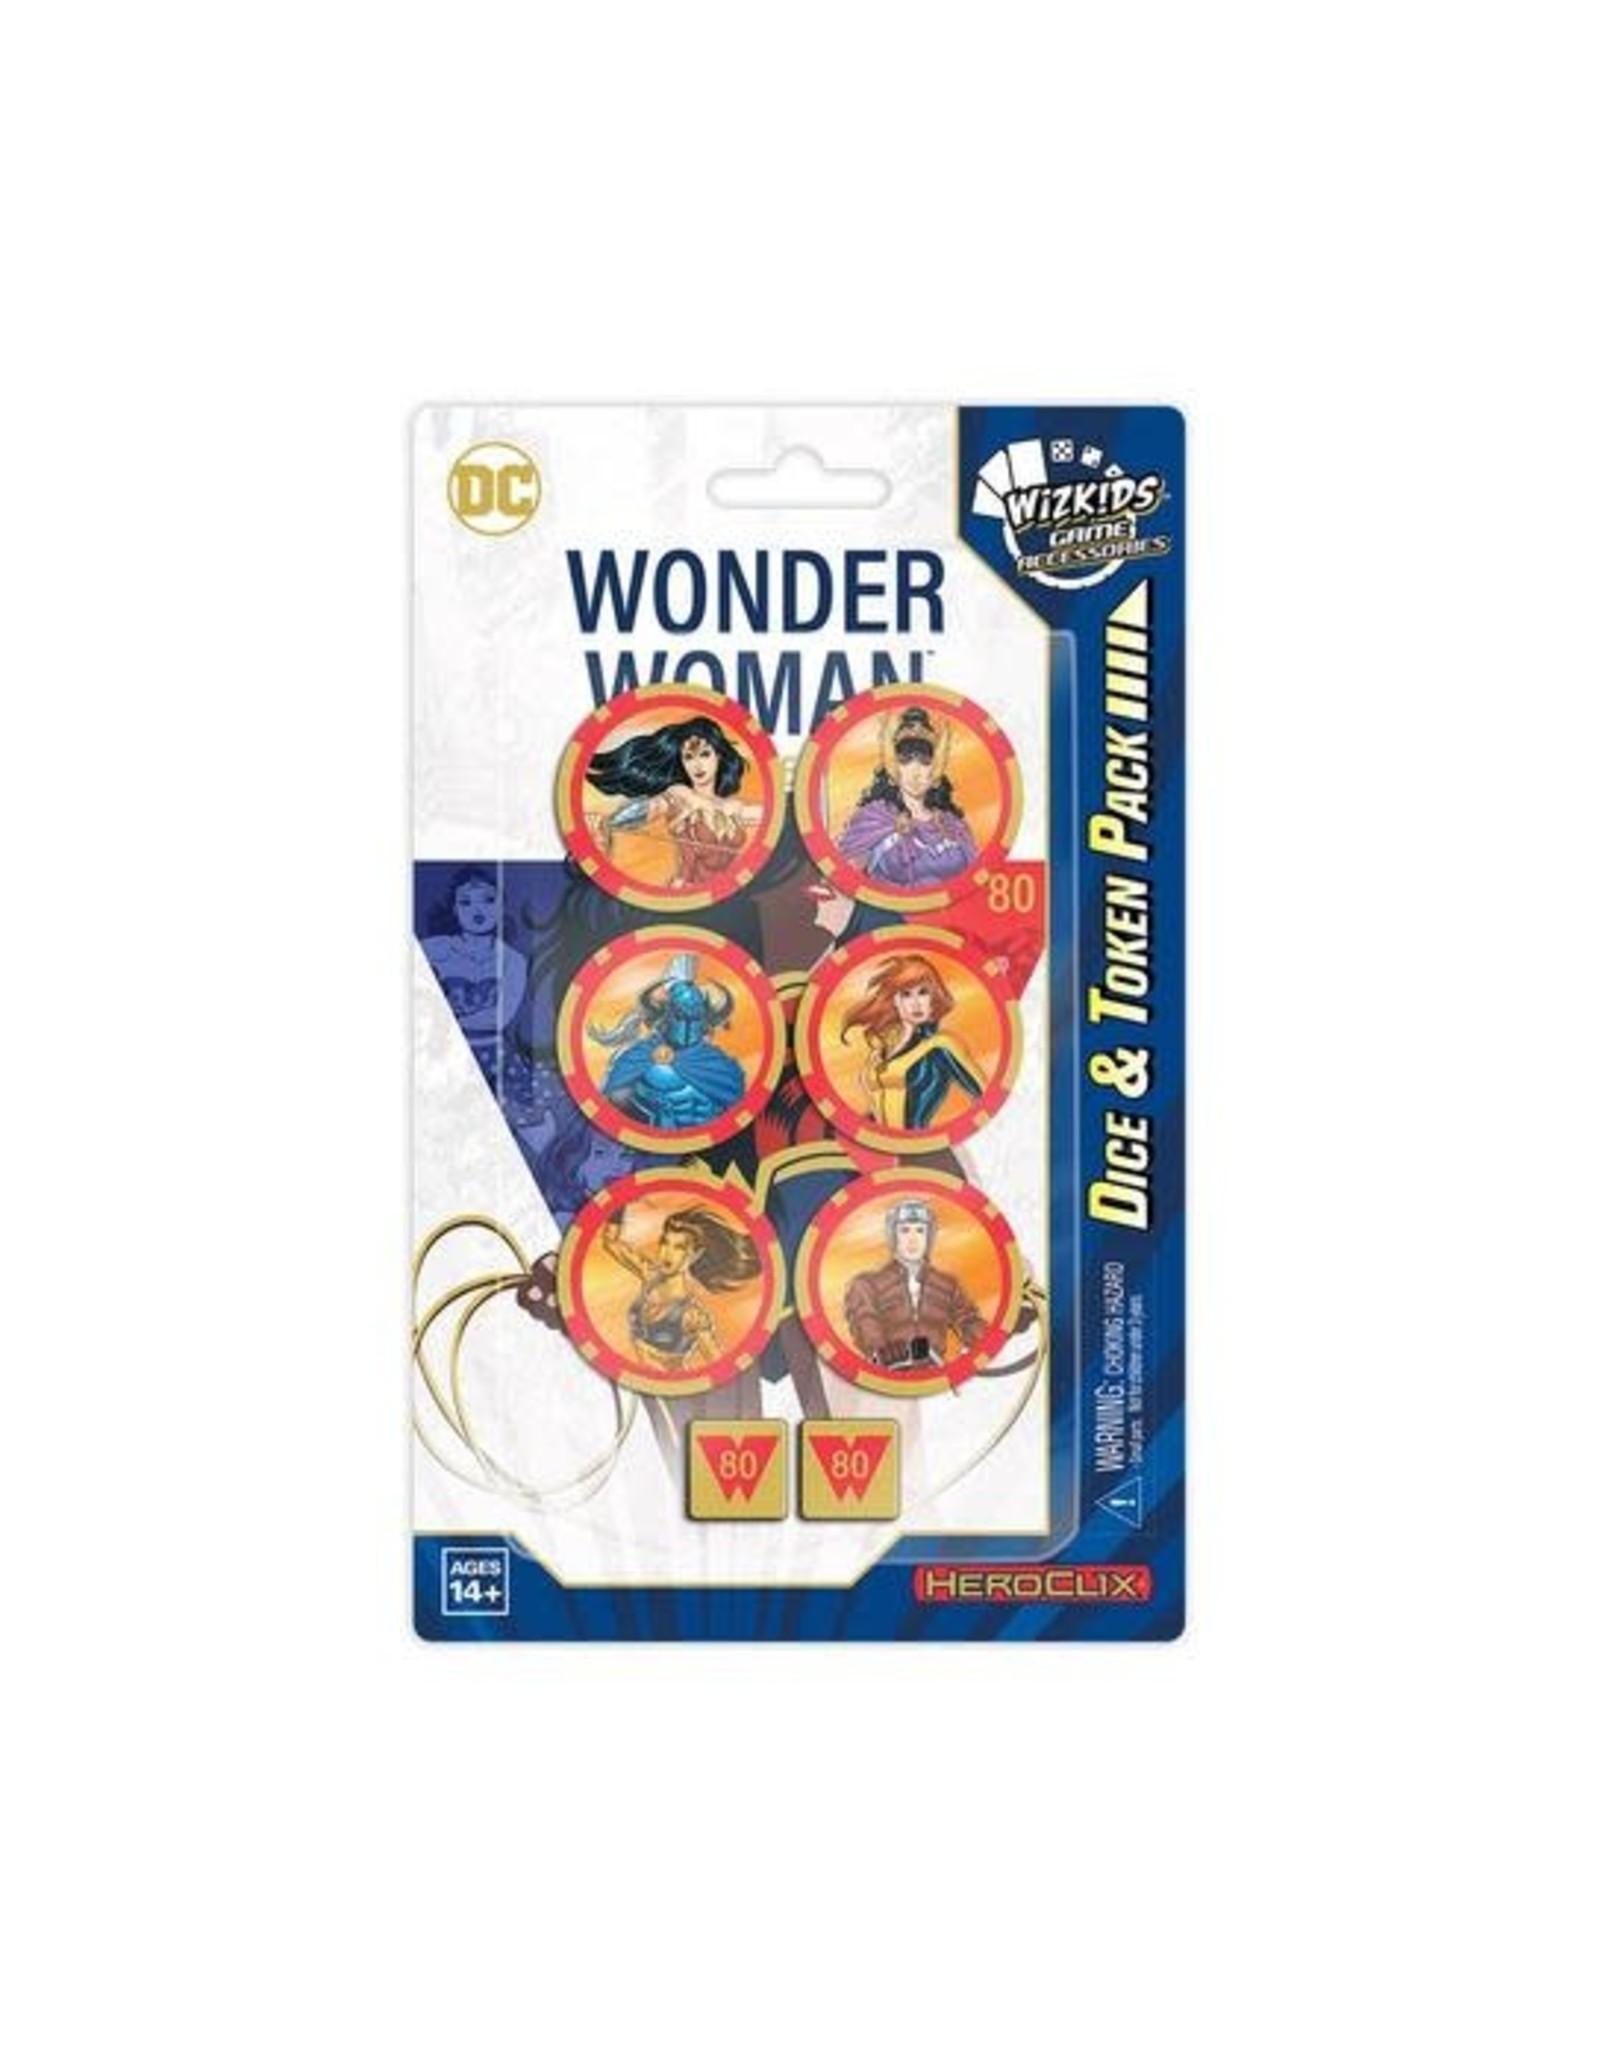 WizKids DC HeroClix: Wonder Woman 80th Anniversary Dice and Token Pack